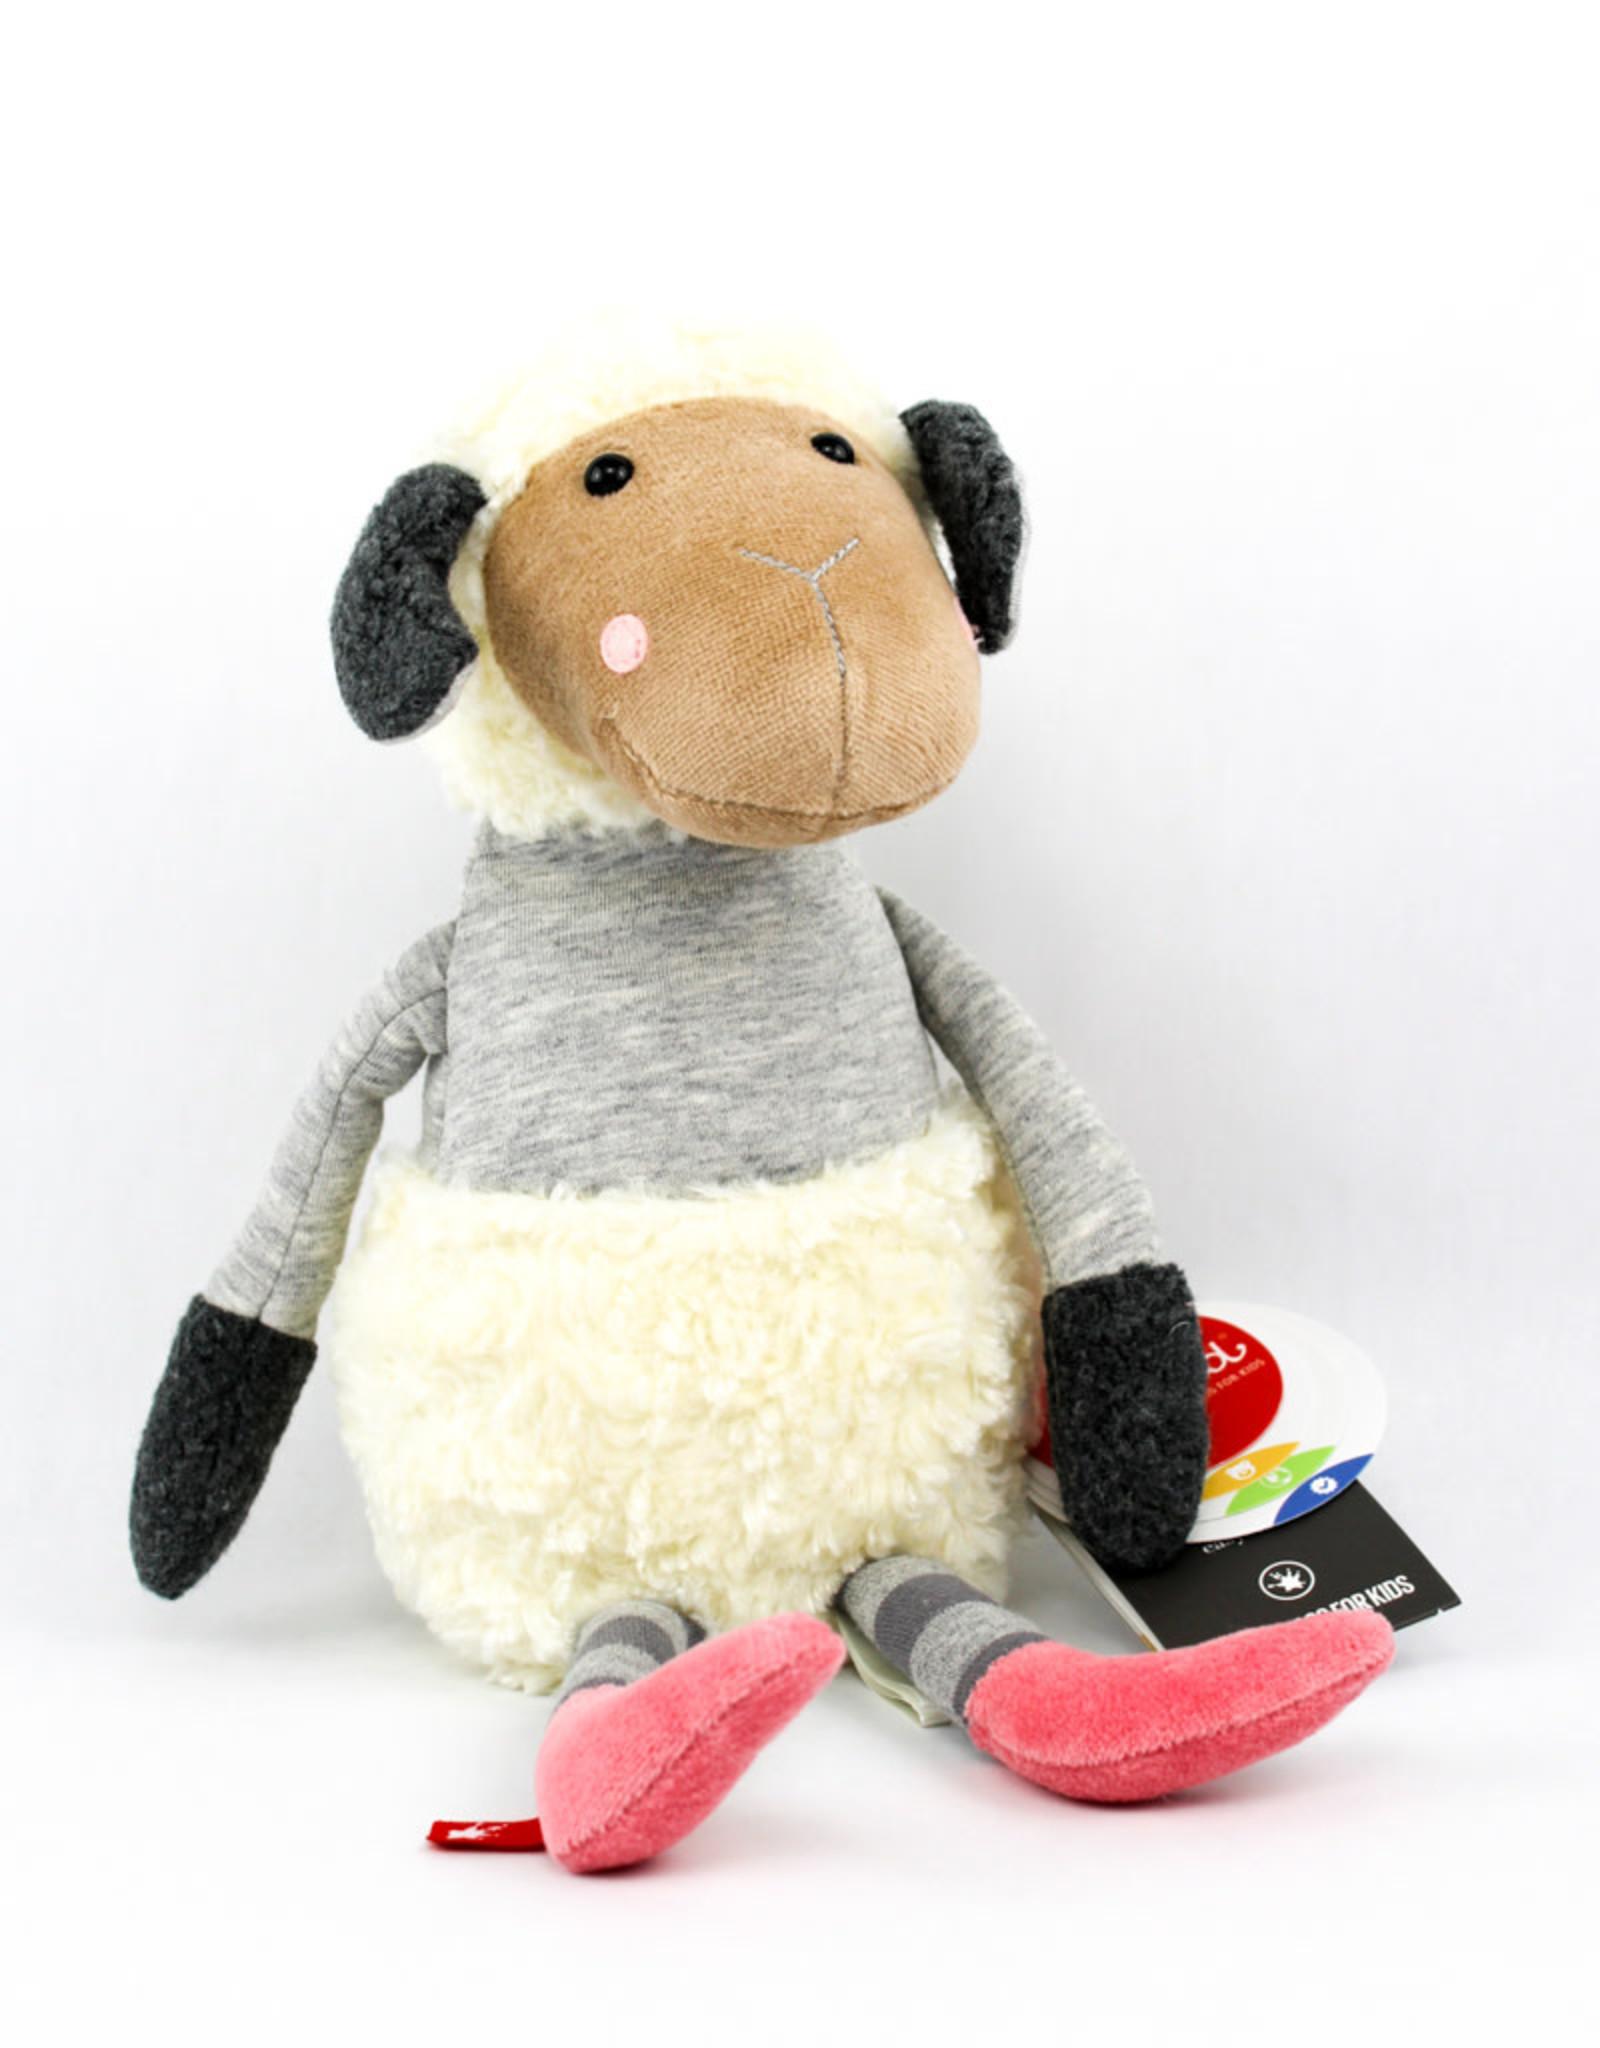 Sigi Kid Urban Patchwork Sheep